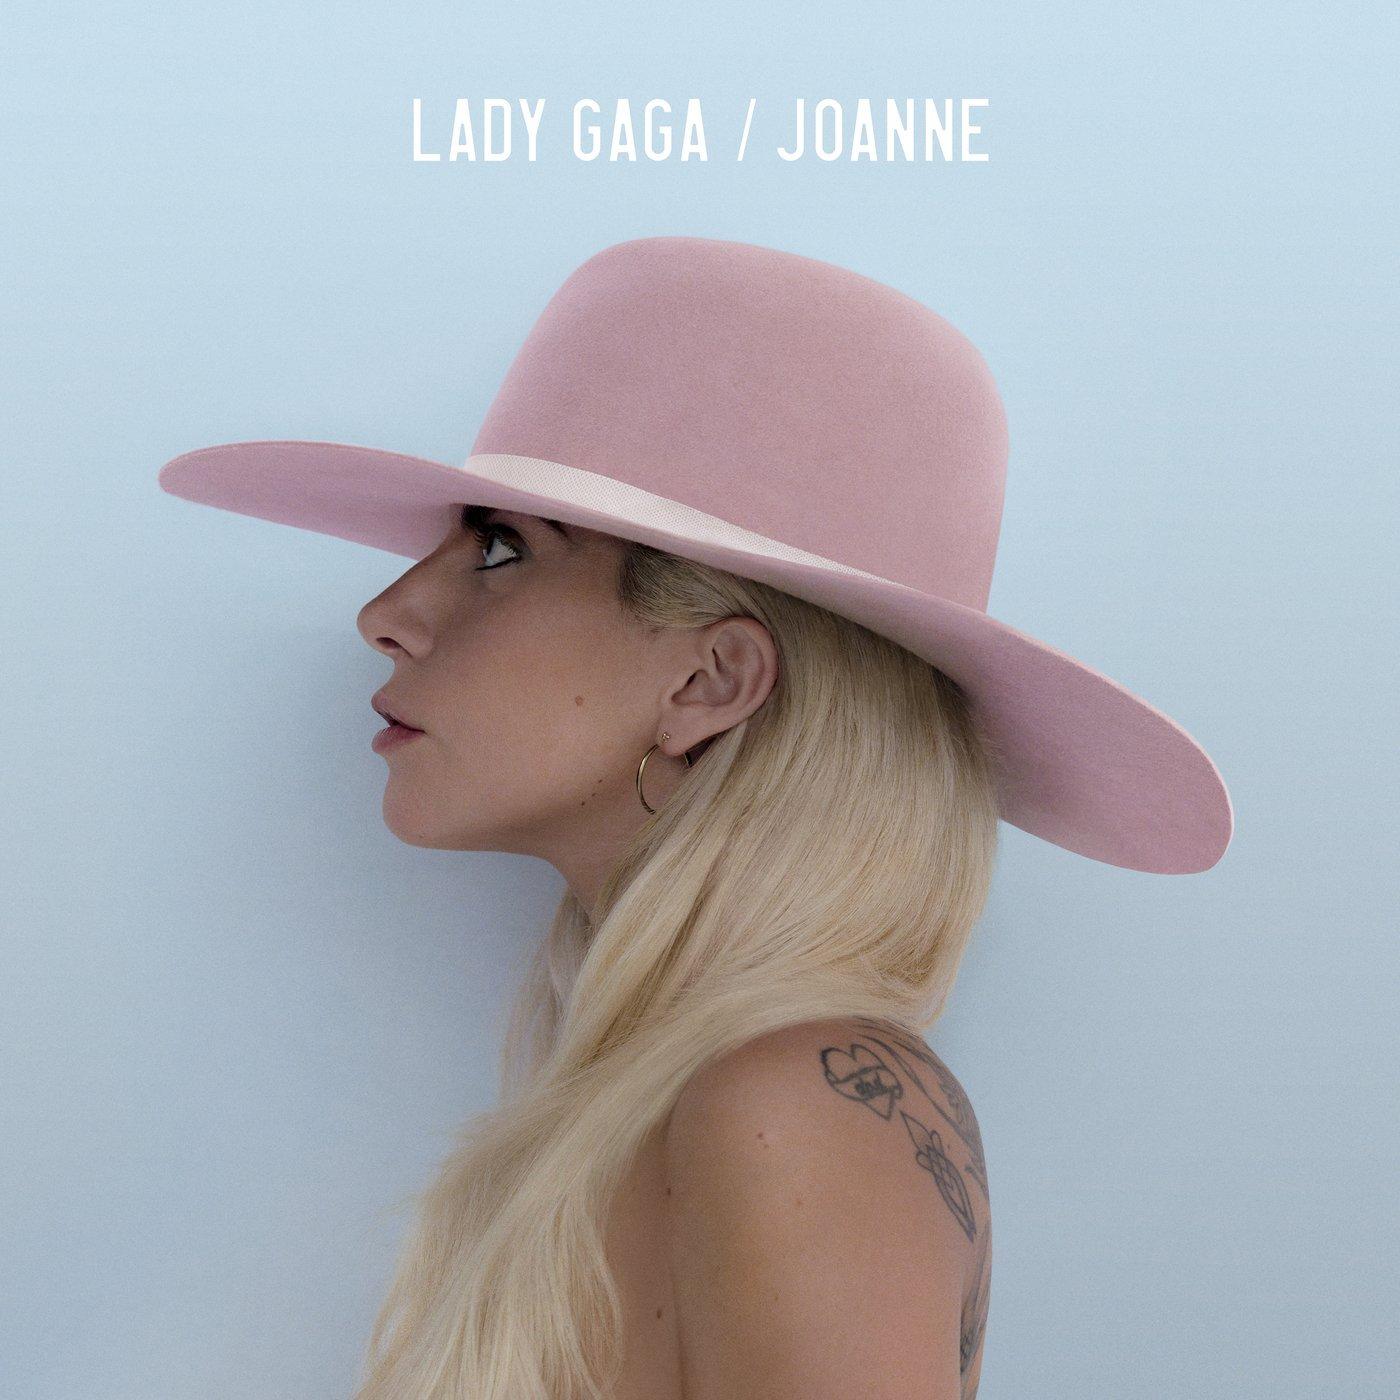 Joanne / LADY GAGAのジャケット